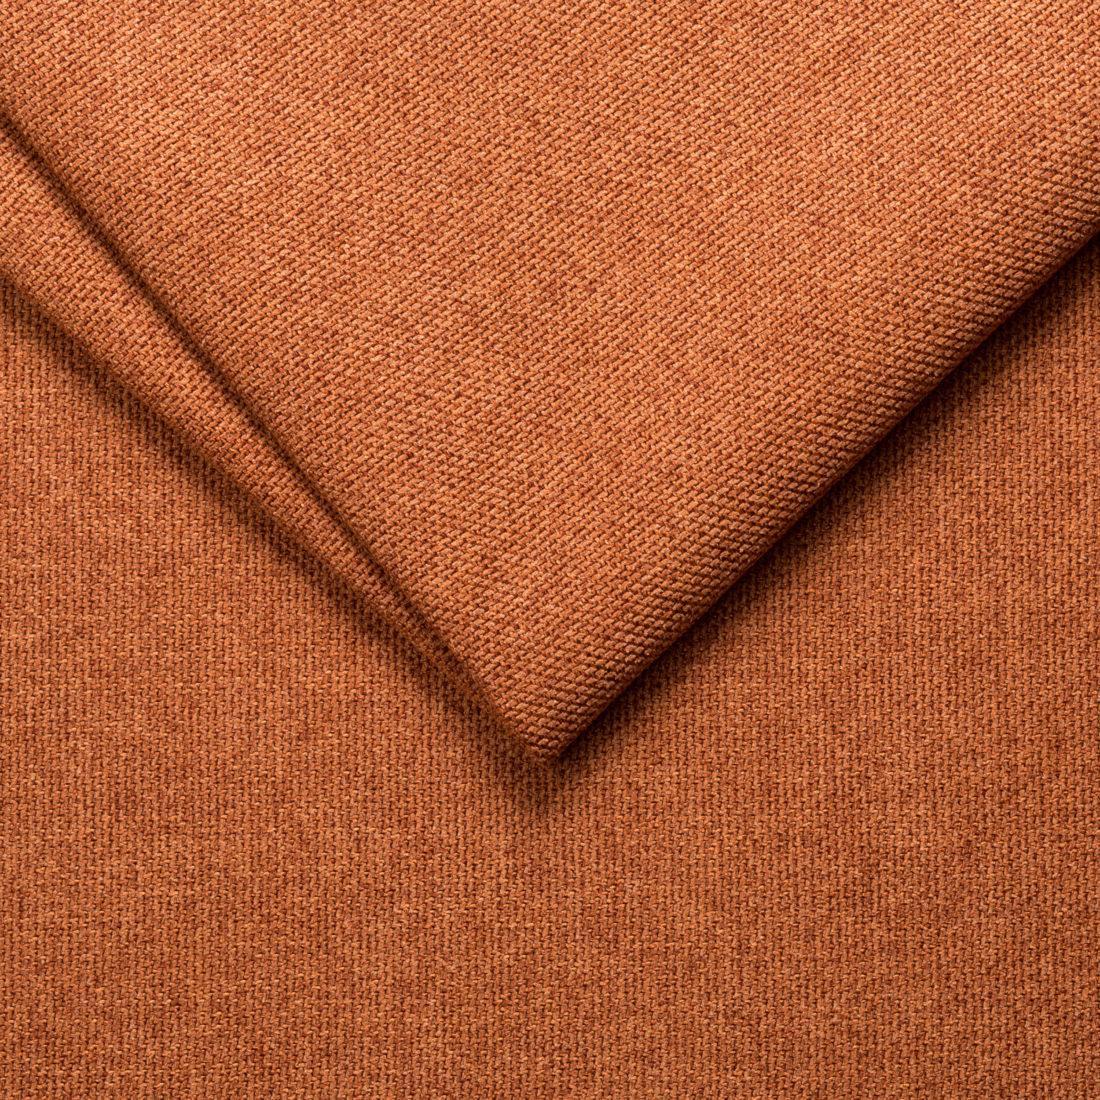 Меблева тканина Austin 9 Rust, рогожка